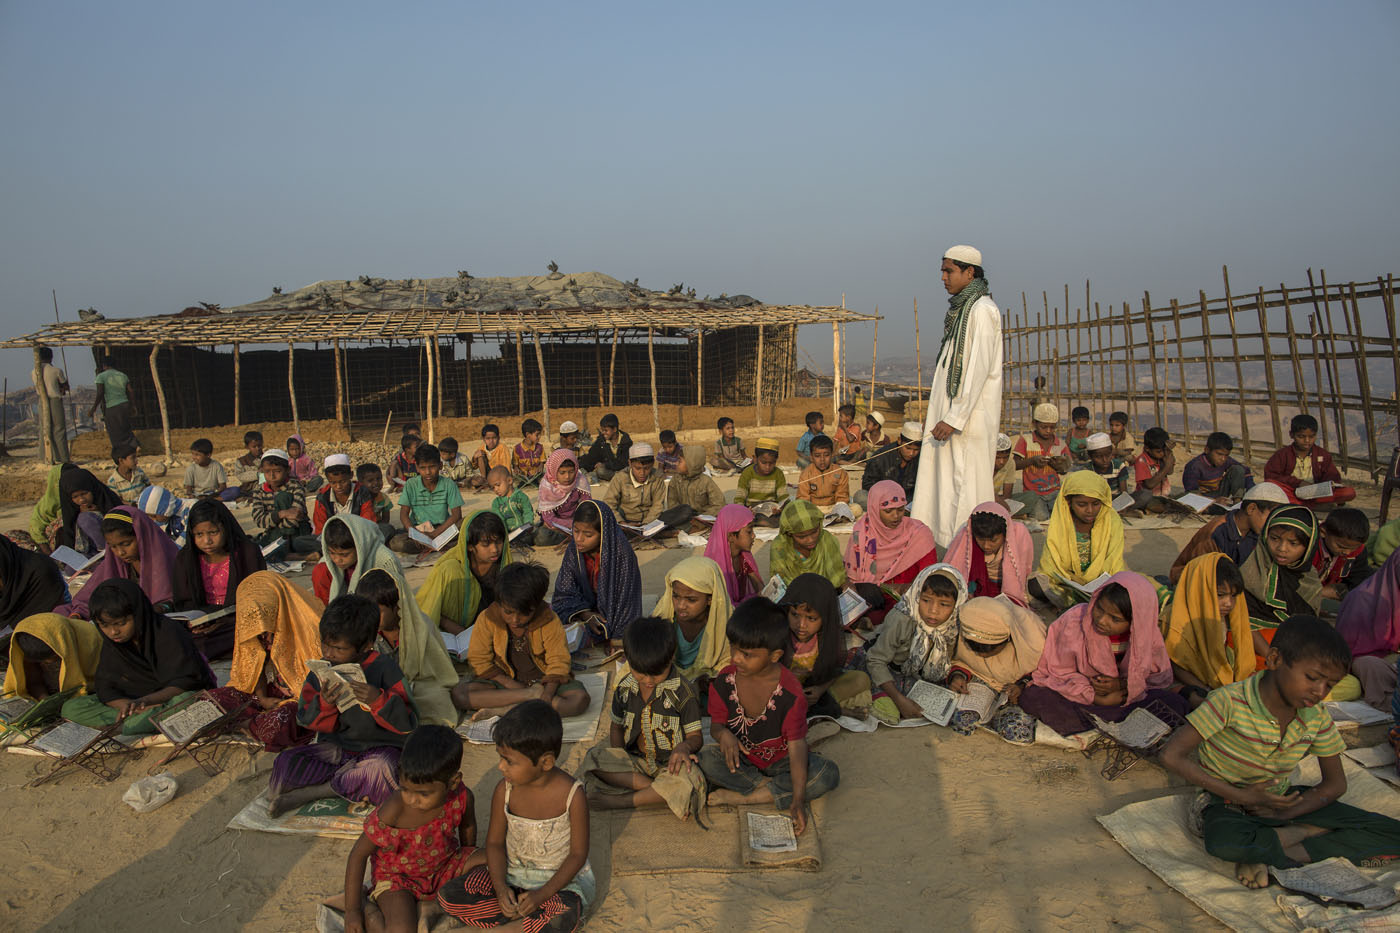 Probal Rashid_Bangladesh_The Rohingyas-A People Without A Home_14.jpg